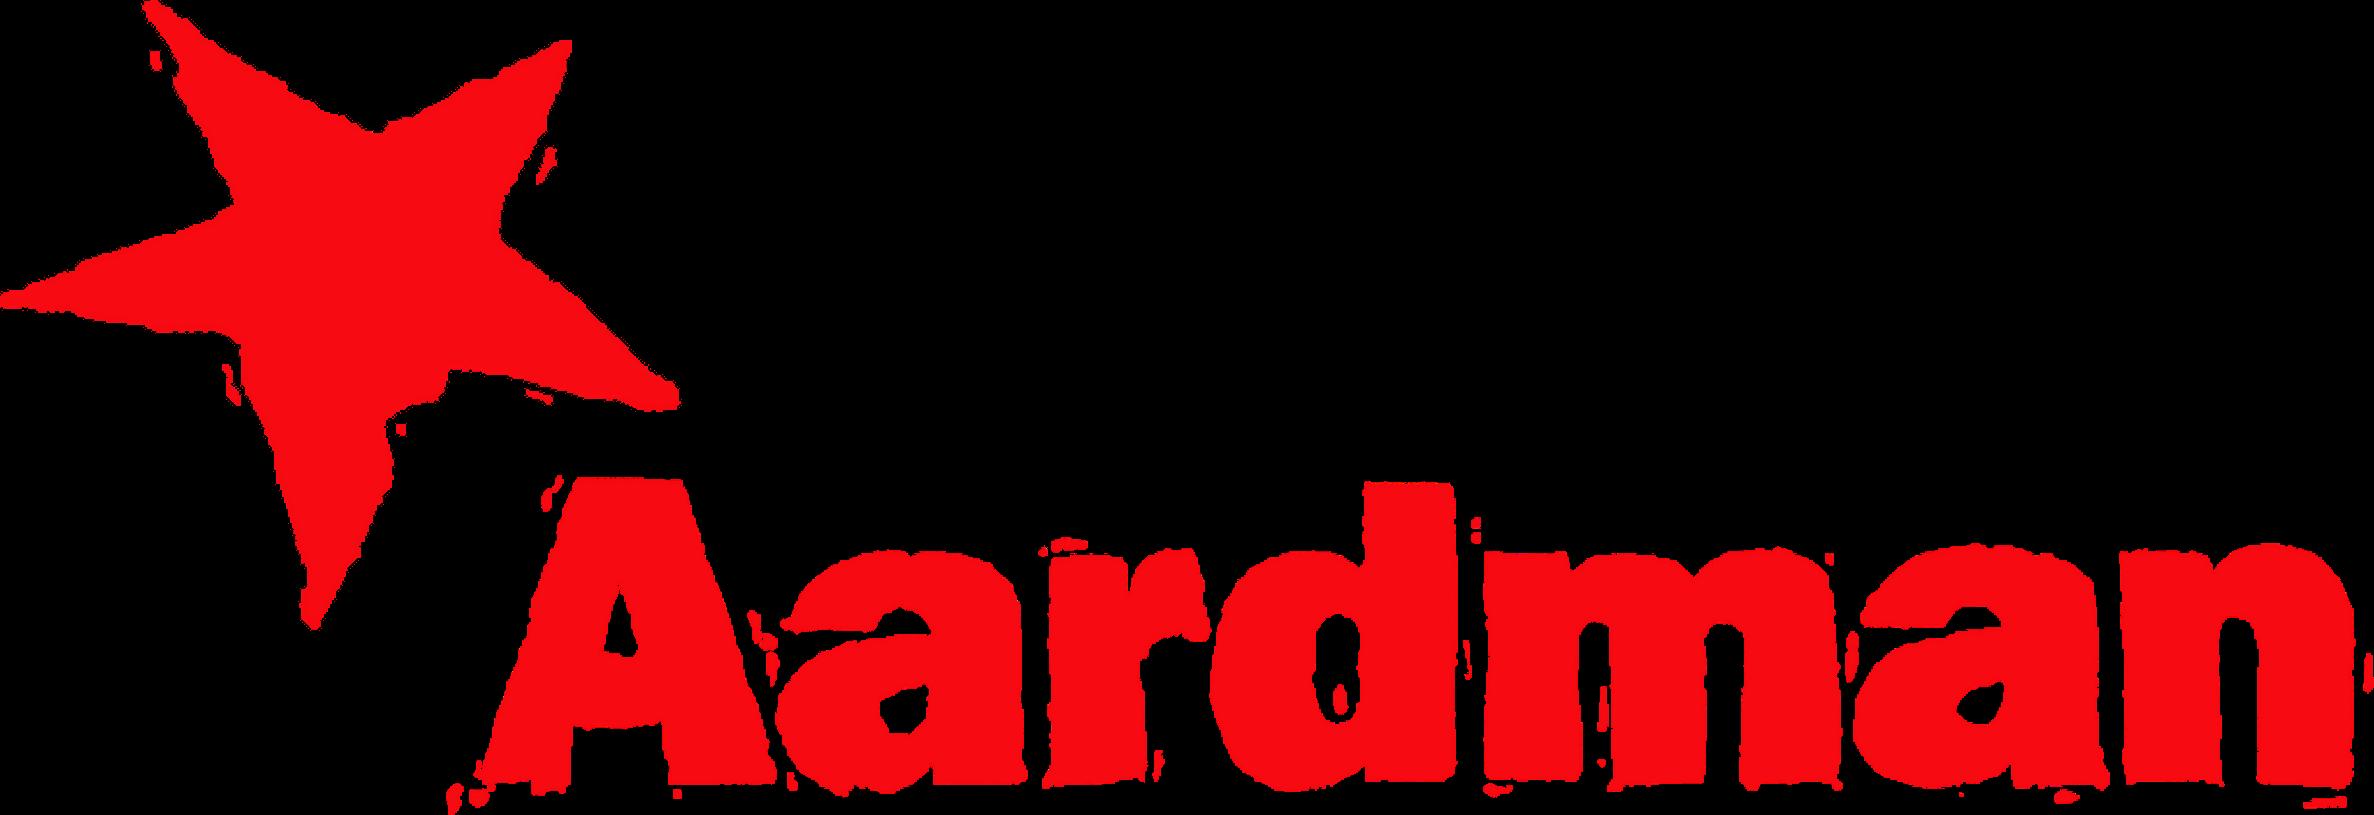 Aardman Animations/Logo Variations